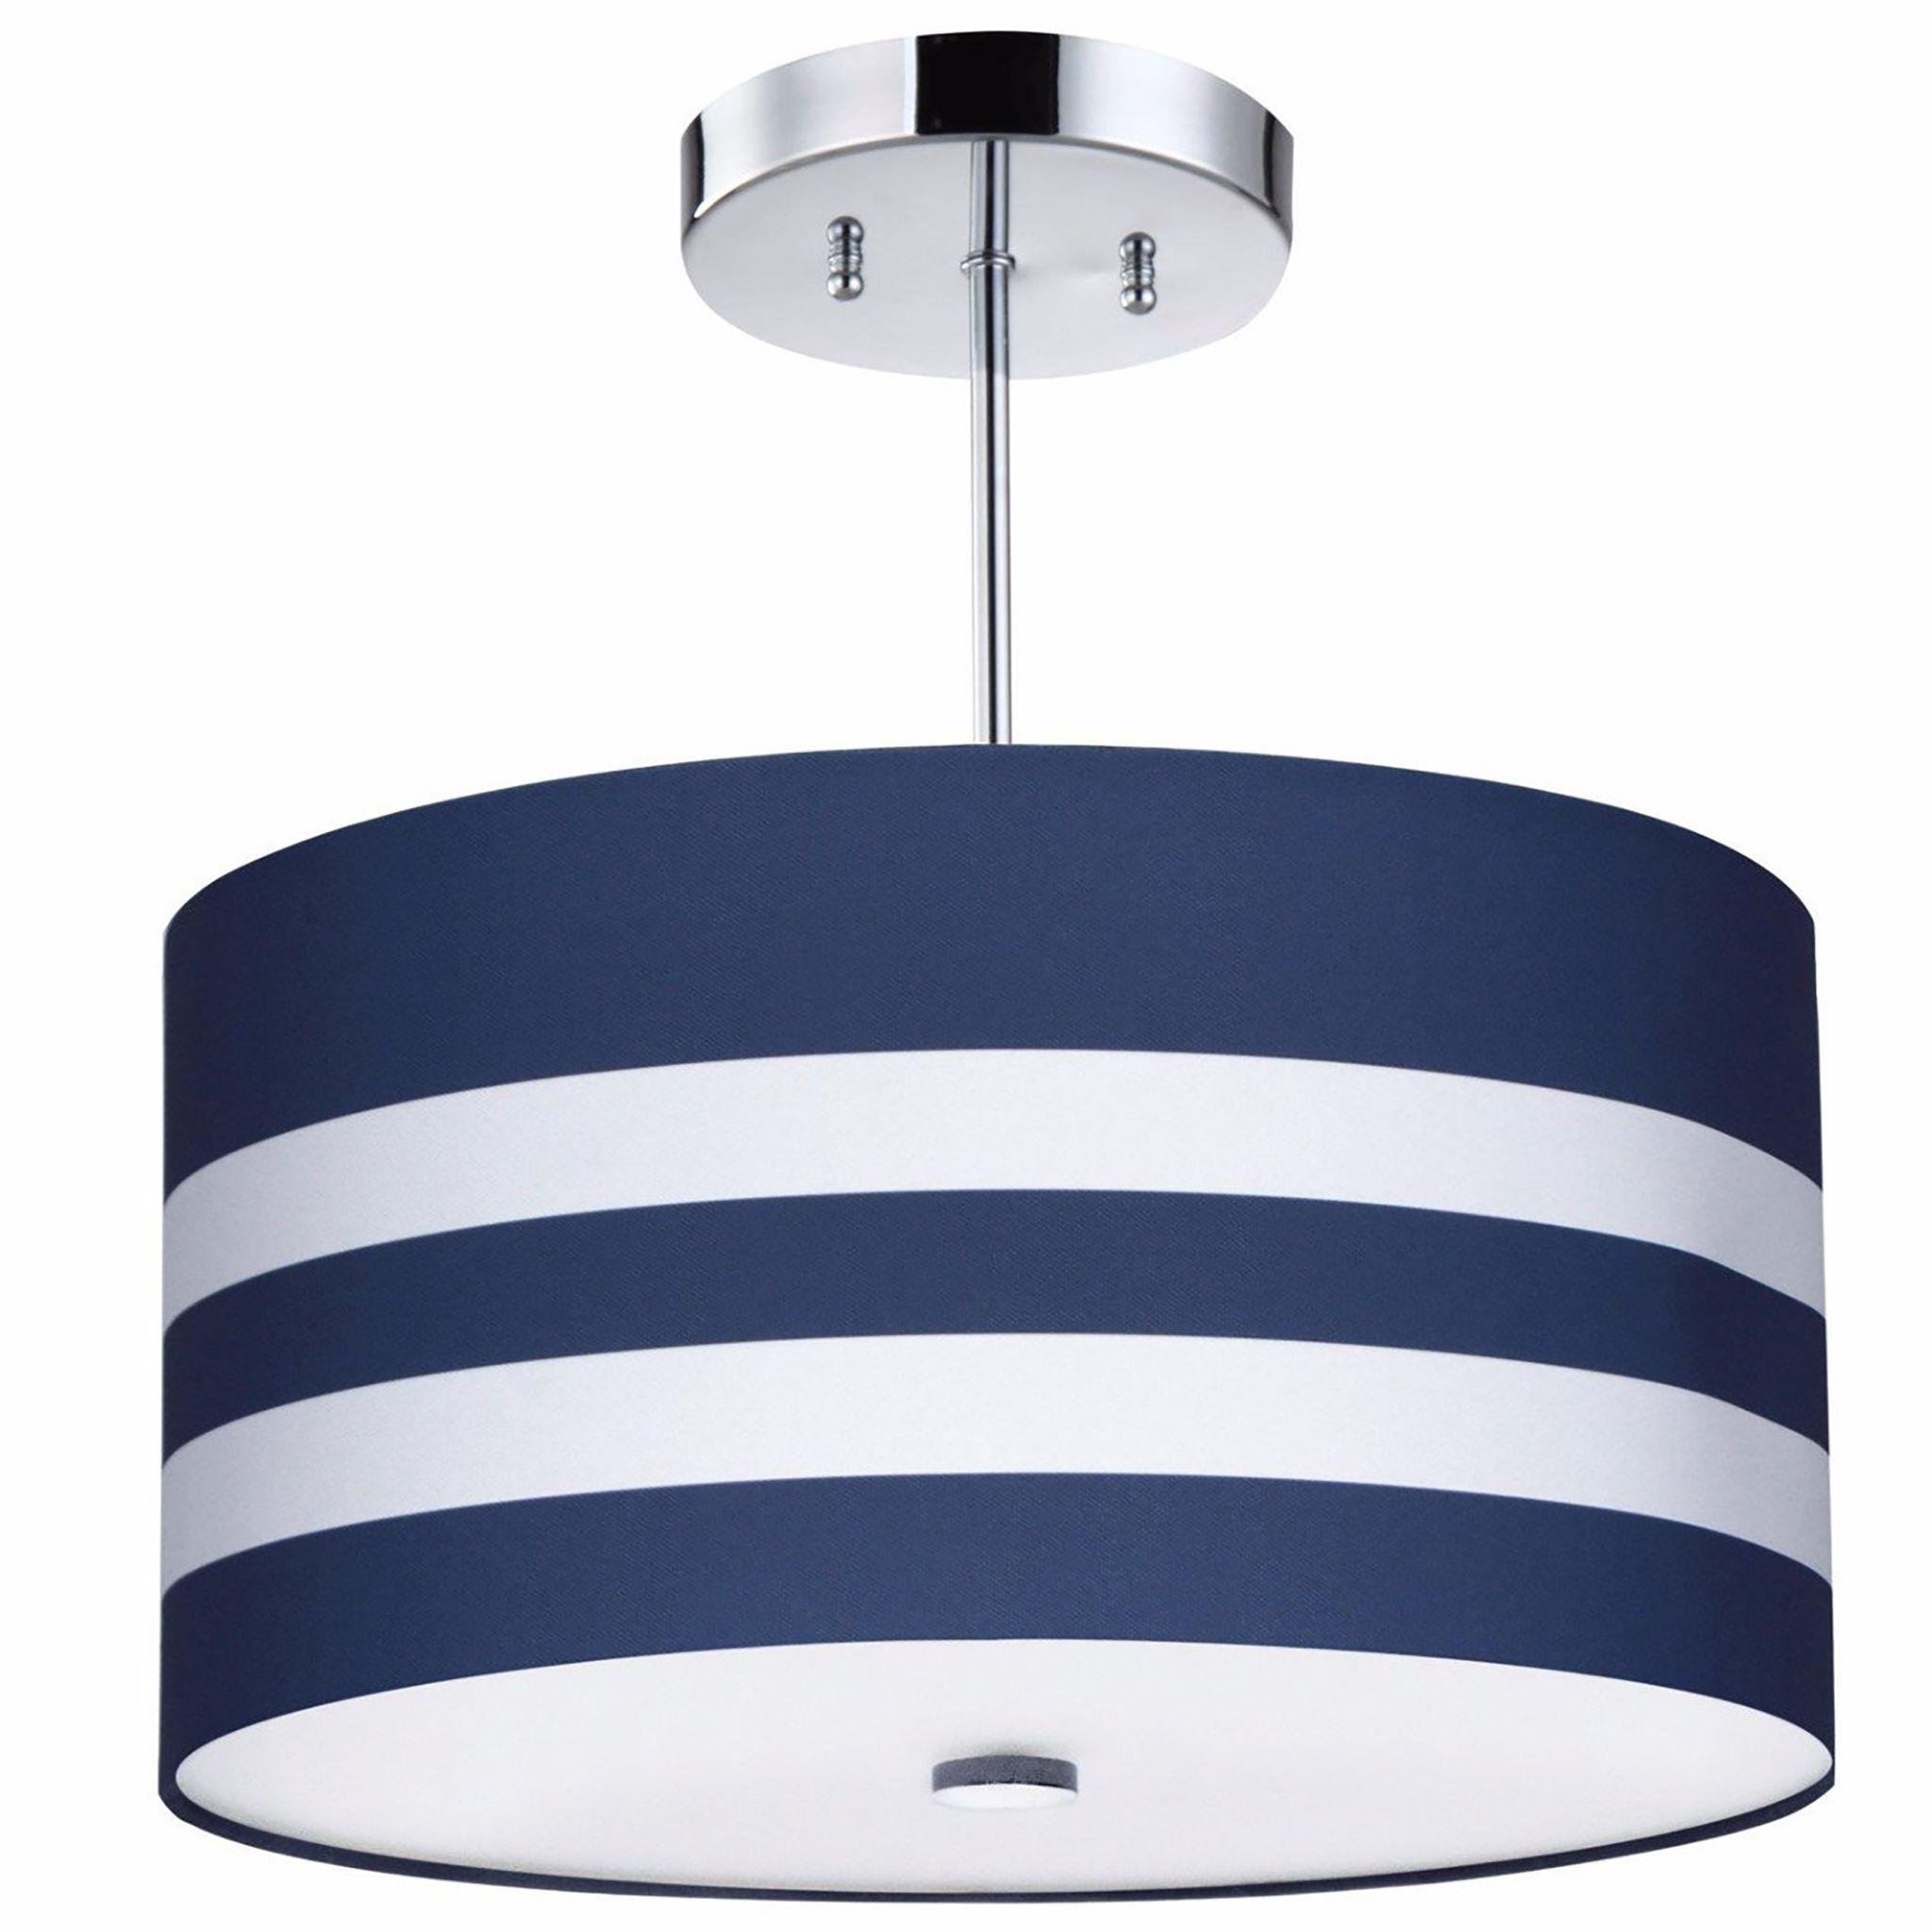 Navy Stripes Light Fixture, 12-Light  Kids room lighting fixture